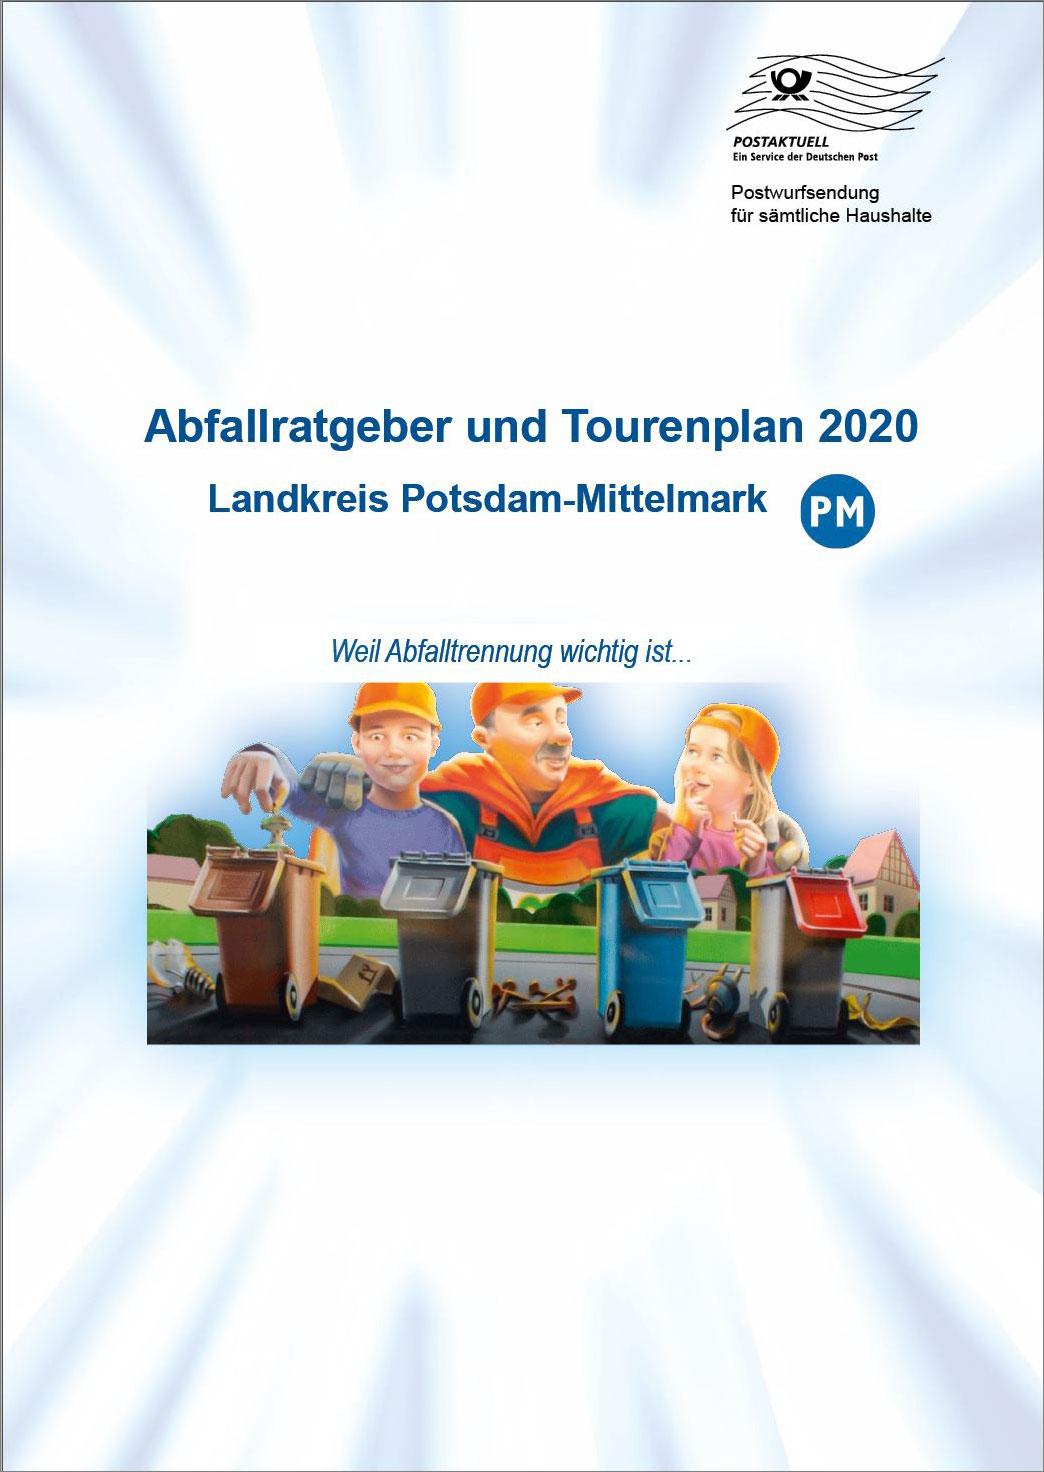 Abfallkalender 2020, APM